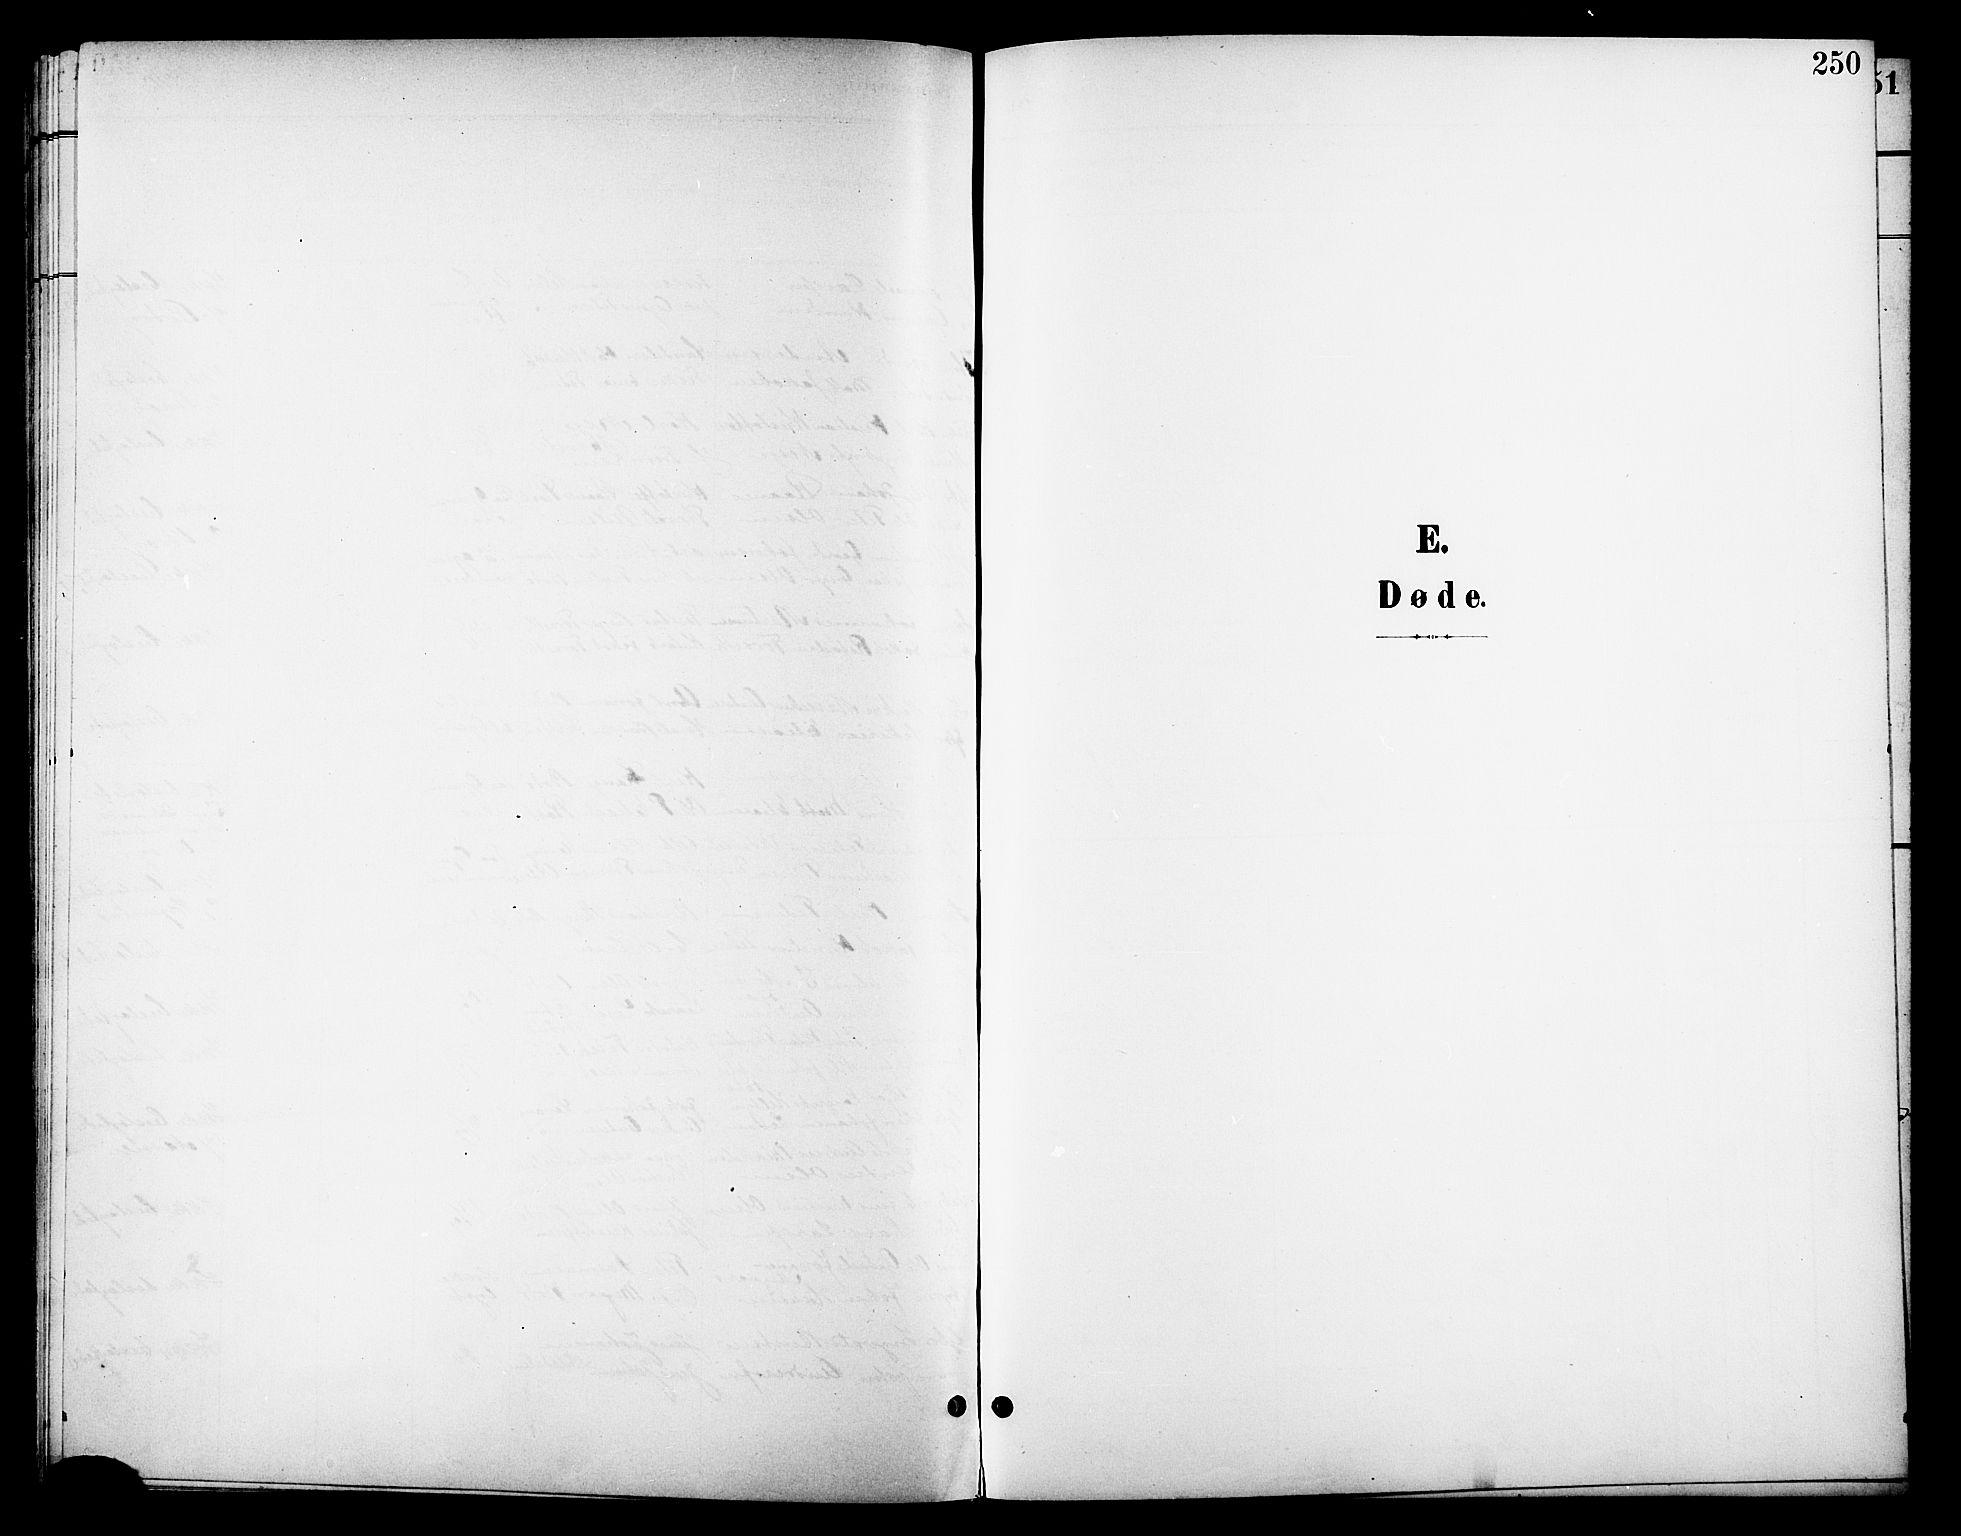 SAT, Ministerialprotokoller, klokkerbøker og fødselsregistre - Nordland, 801/L0033: Klokkerbok nr. 801C08, 1898-1910, s. 250